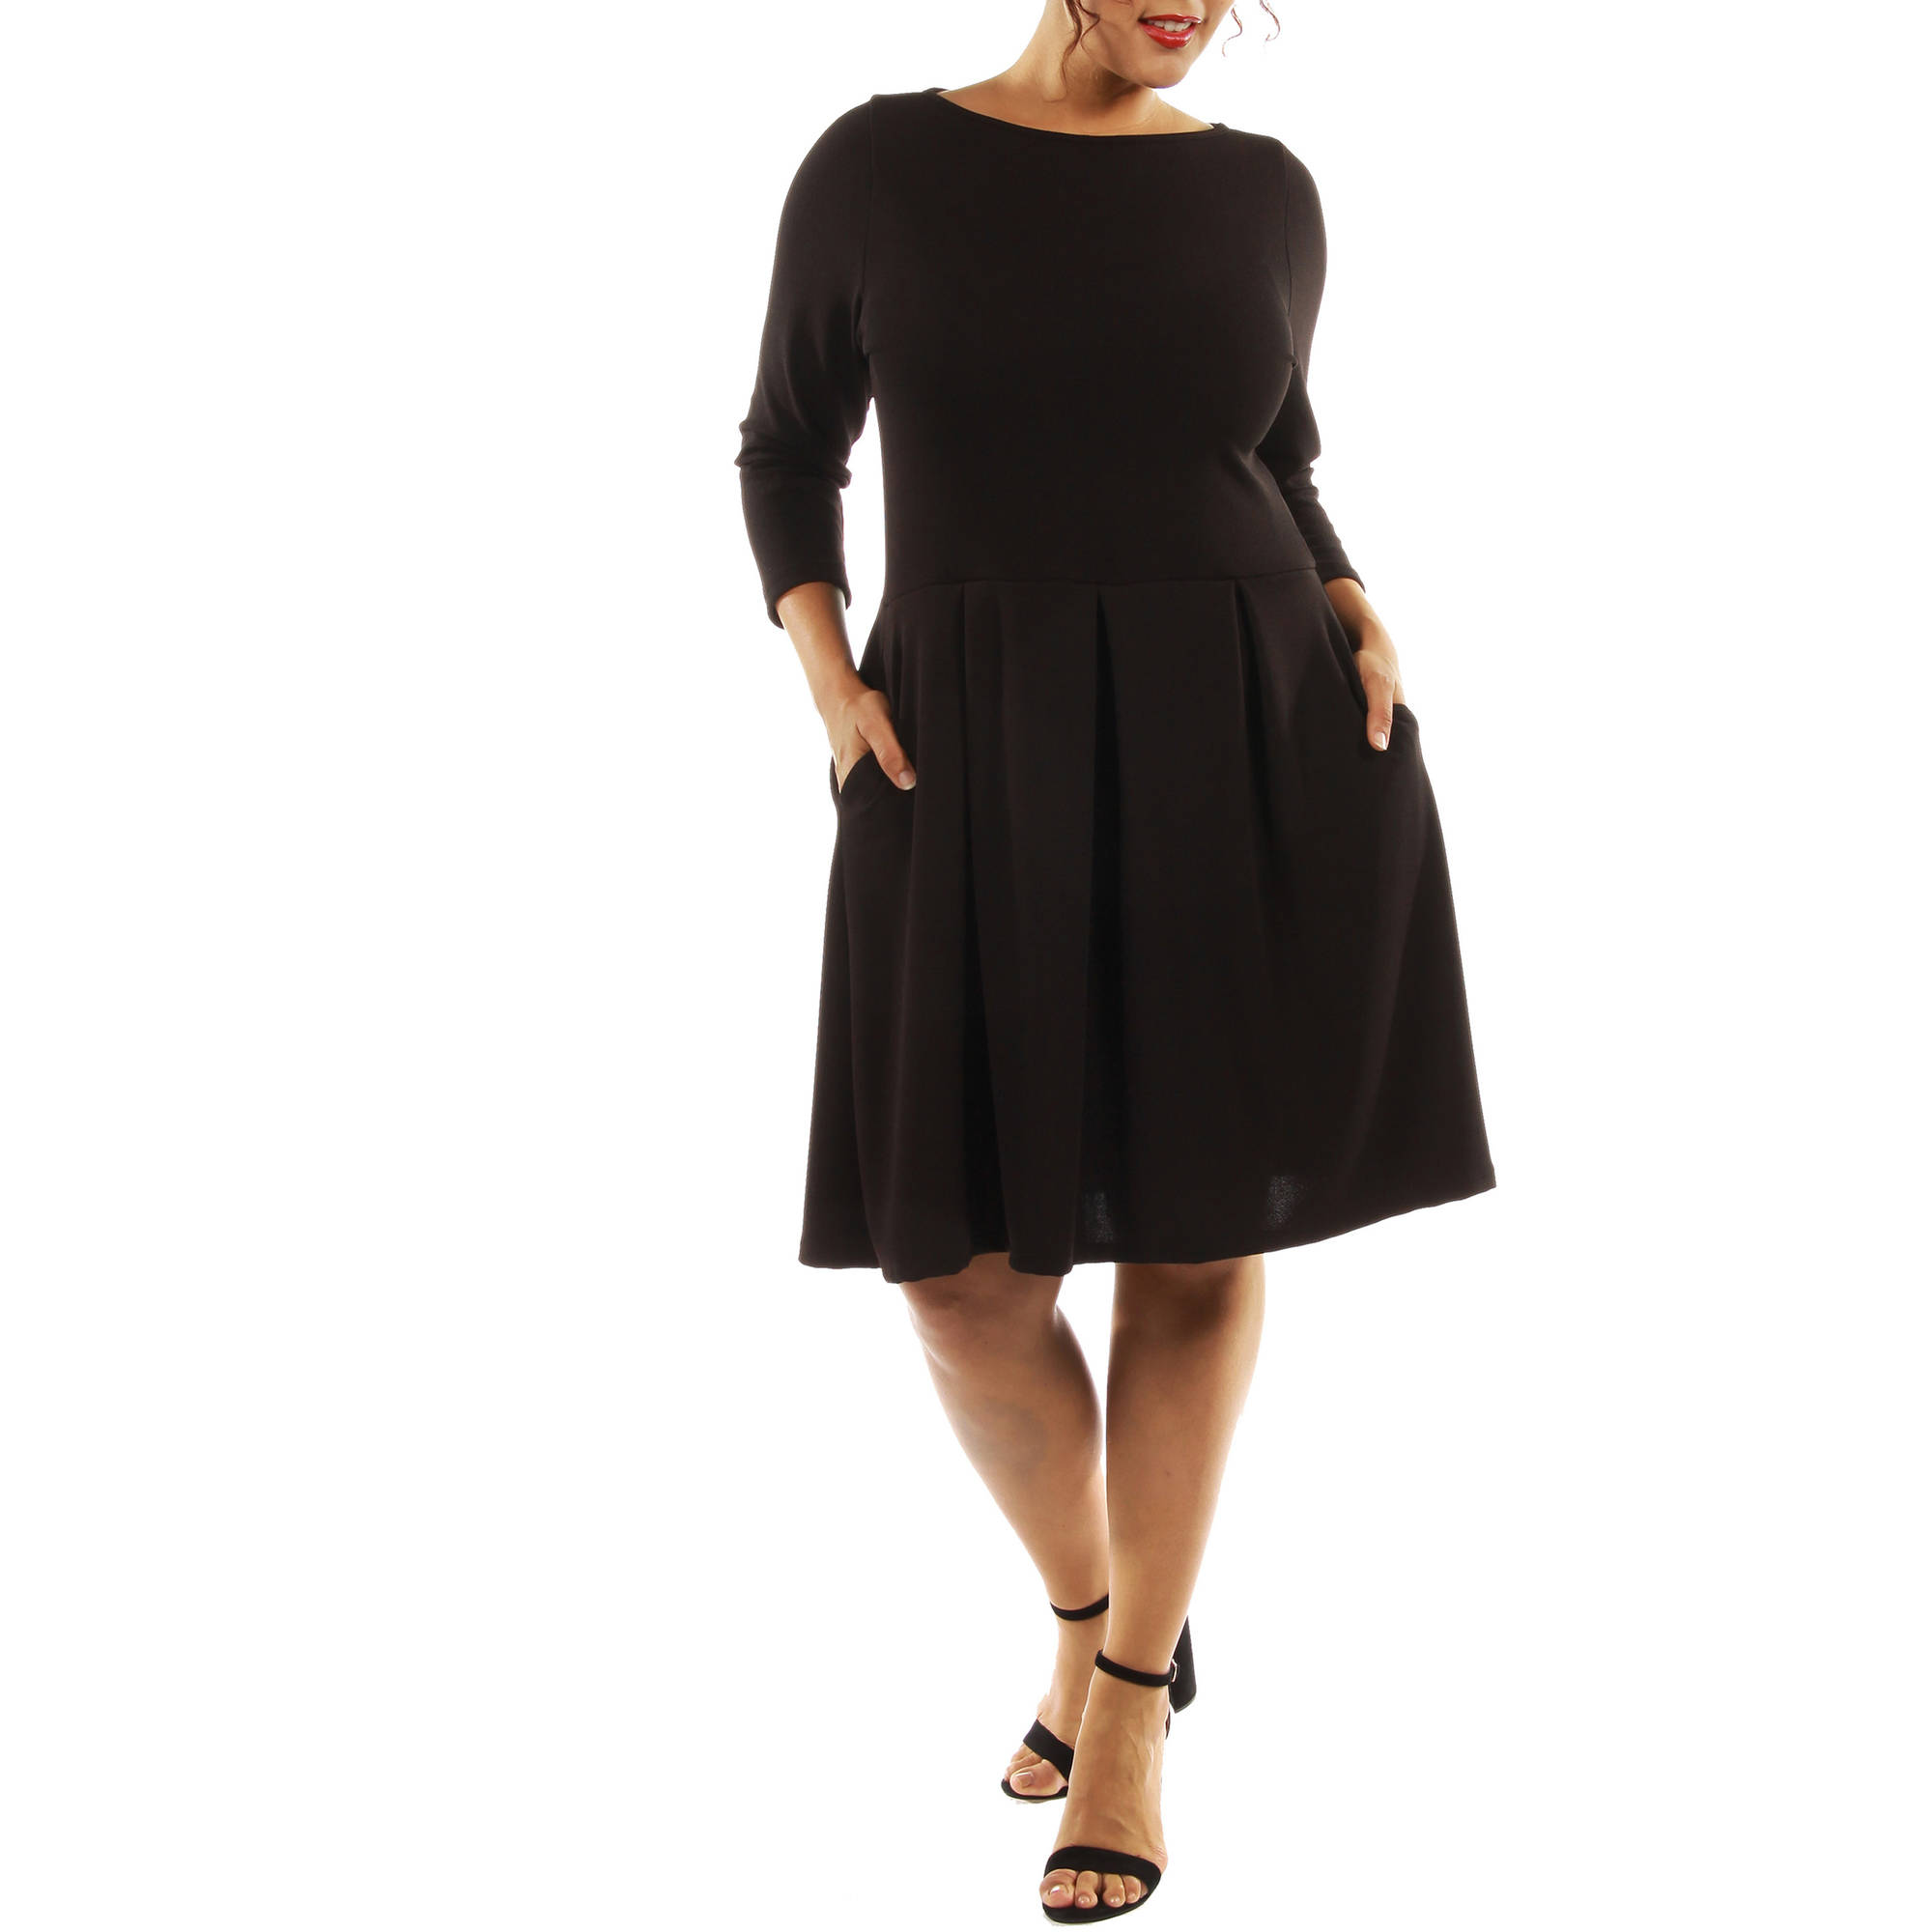 Brilliant Avital Classic Little Black Sleeveless Dress Womens Scoop Neck Casual